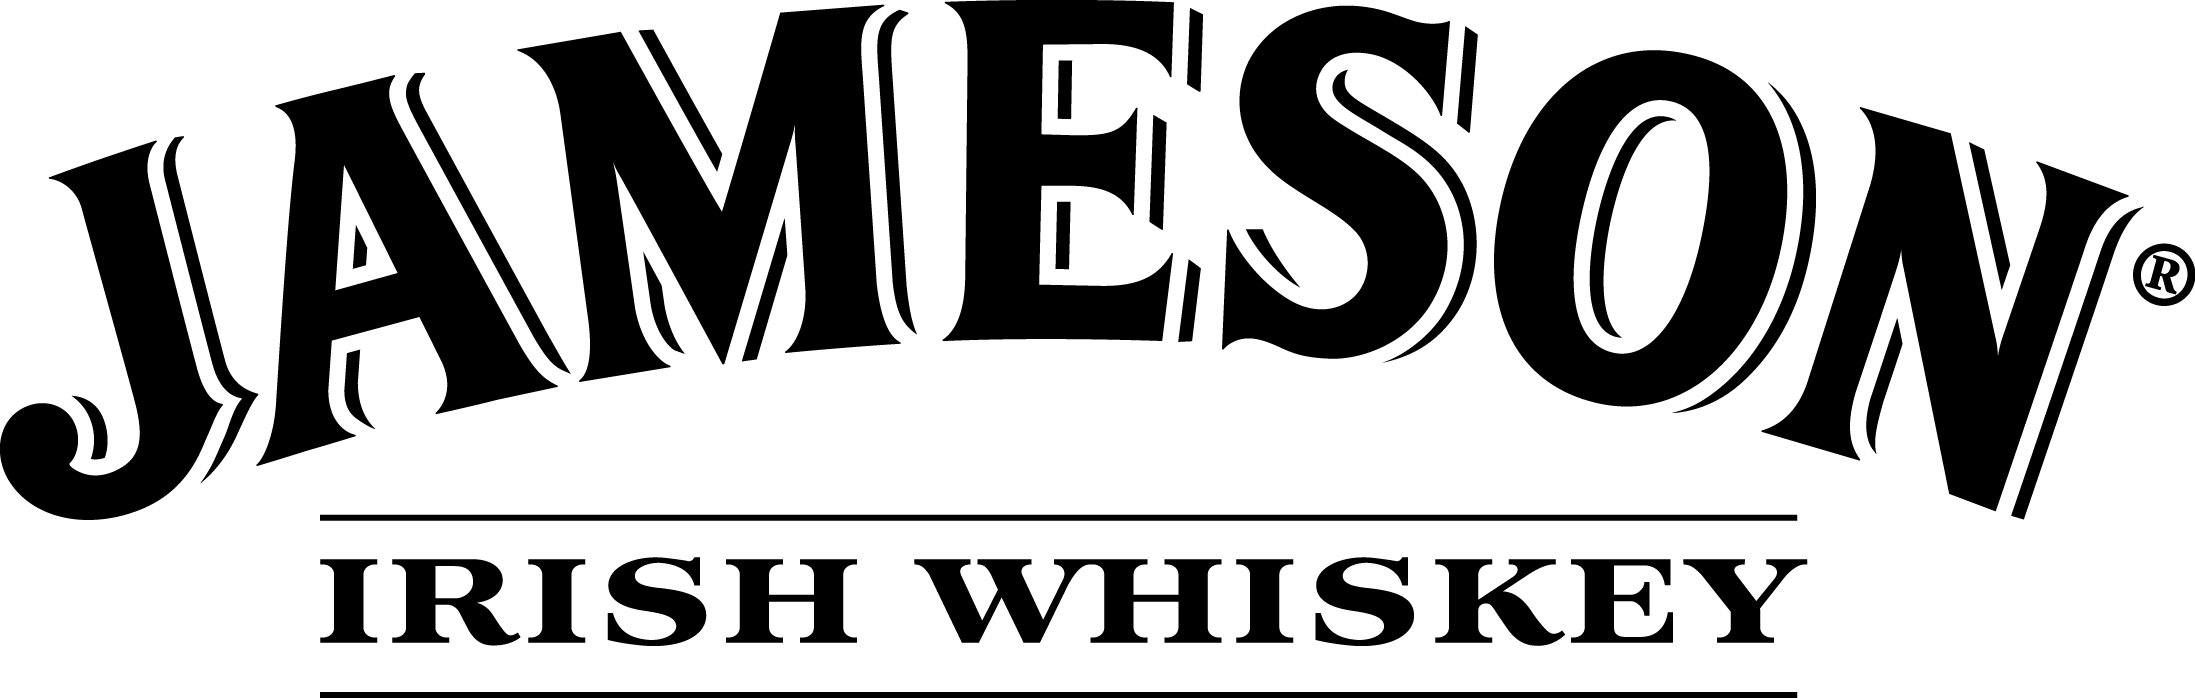 jameson logo font qbn